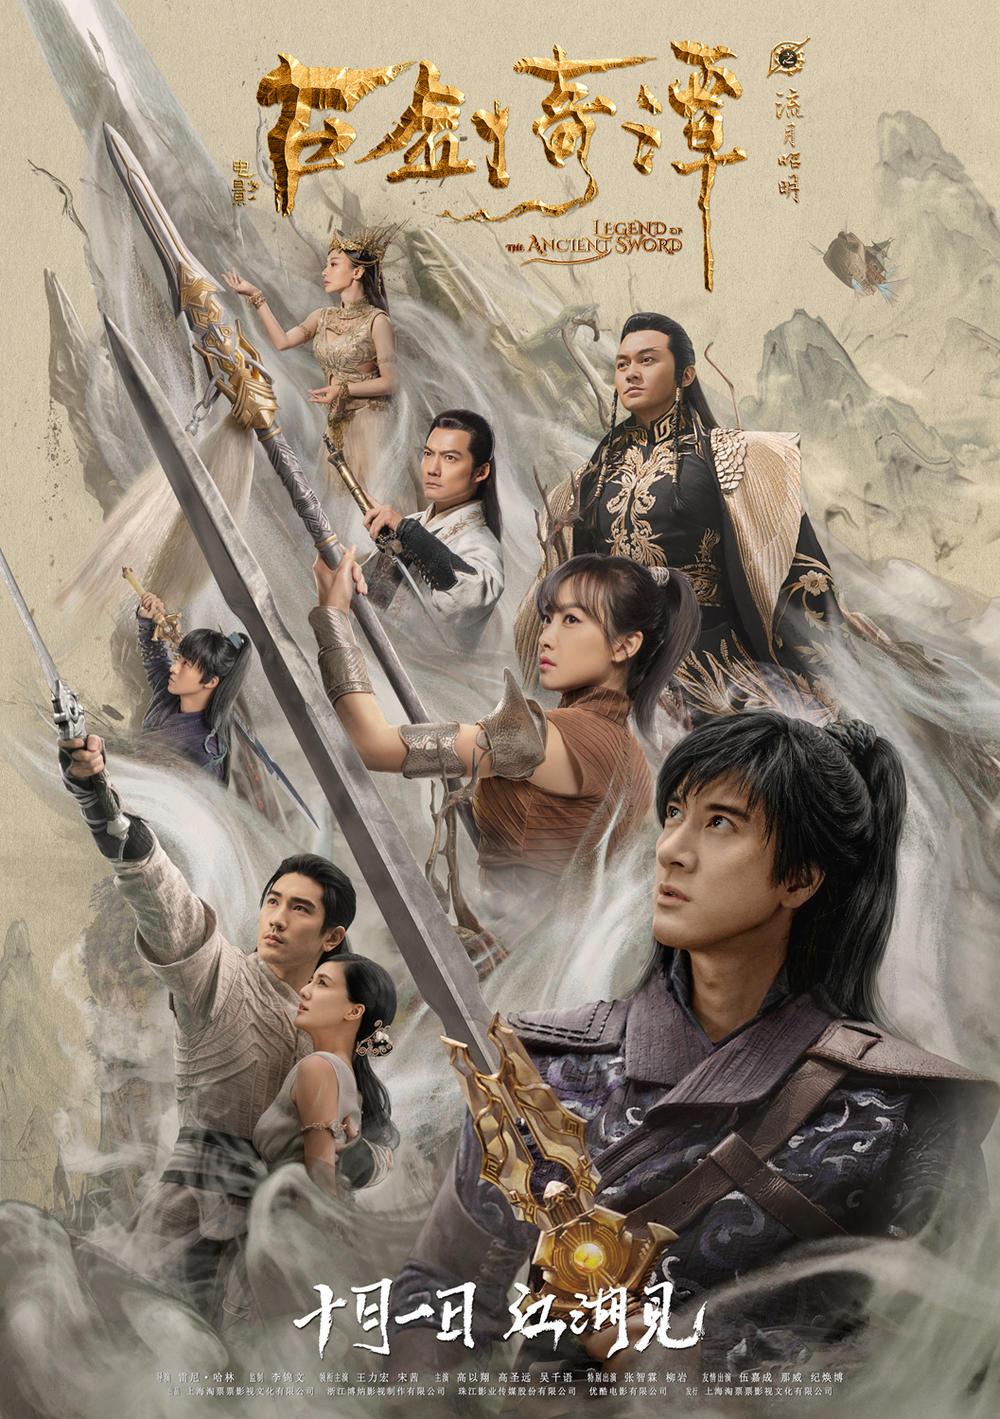 LEGEND OF THE ANCIENT SWORD (2...